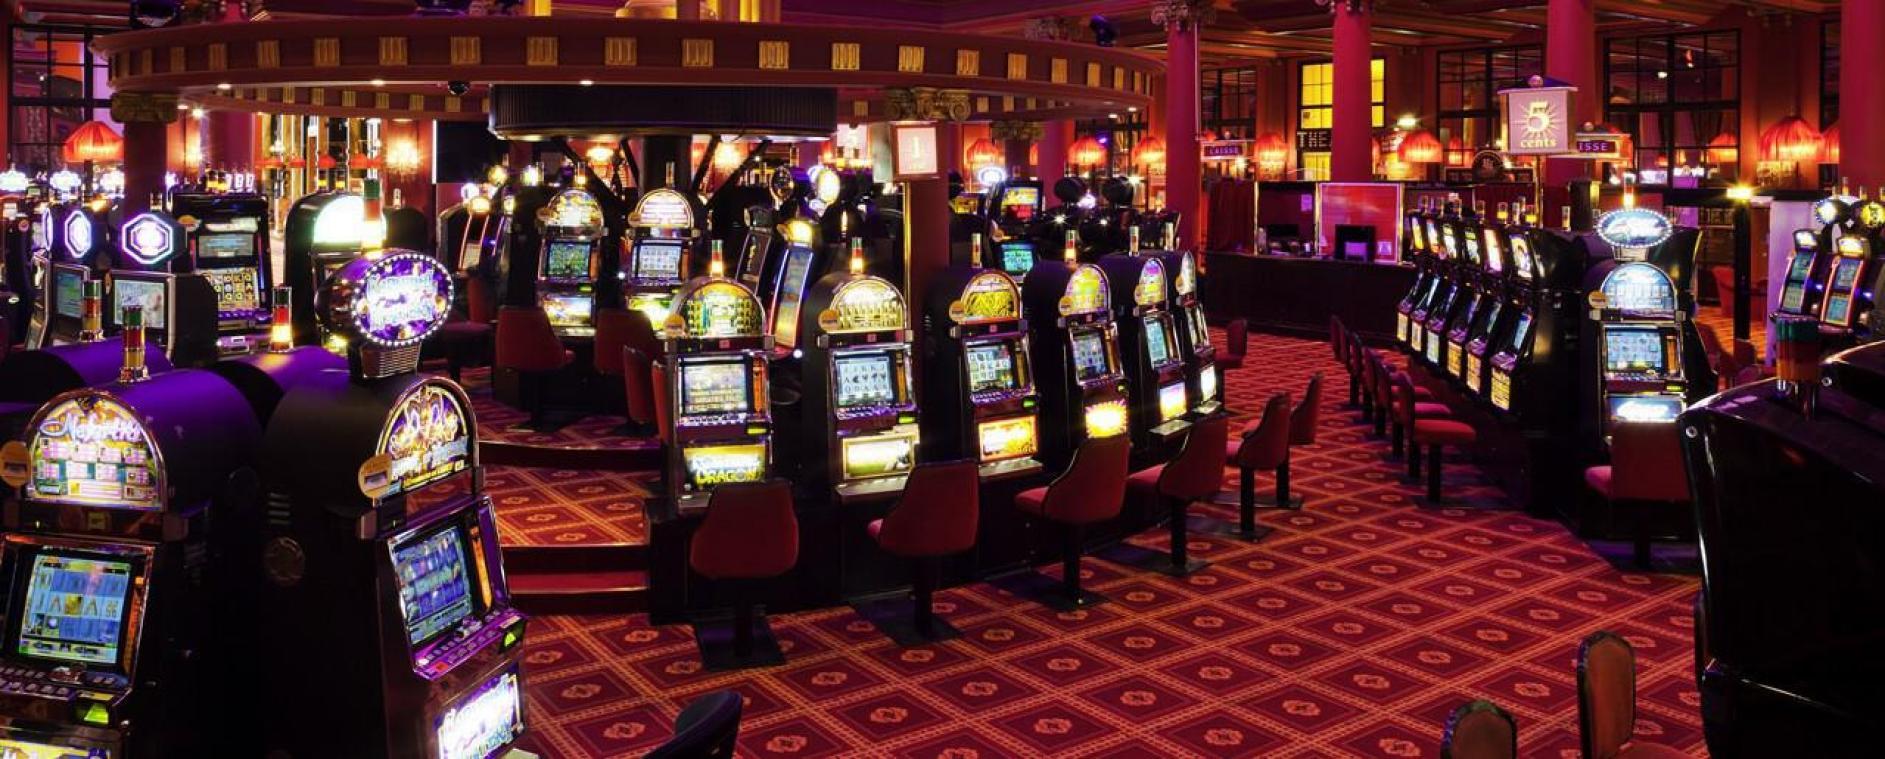 Casinos Barrière: le groupe va licencier « environ 70 salariés », selon FO